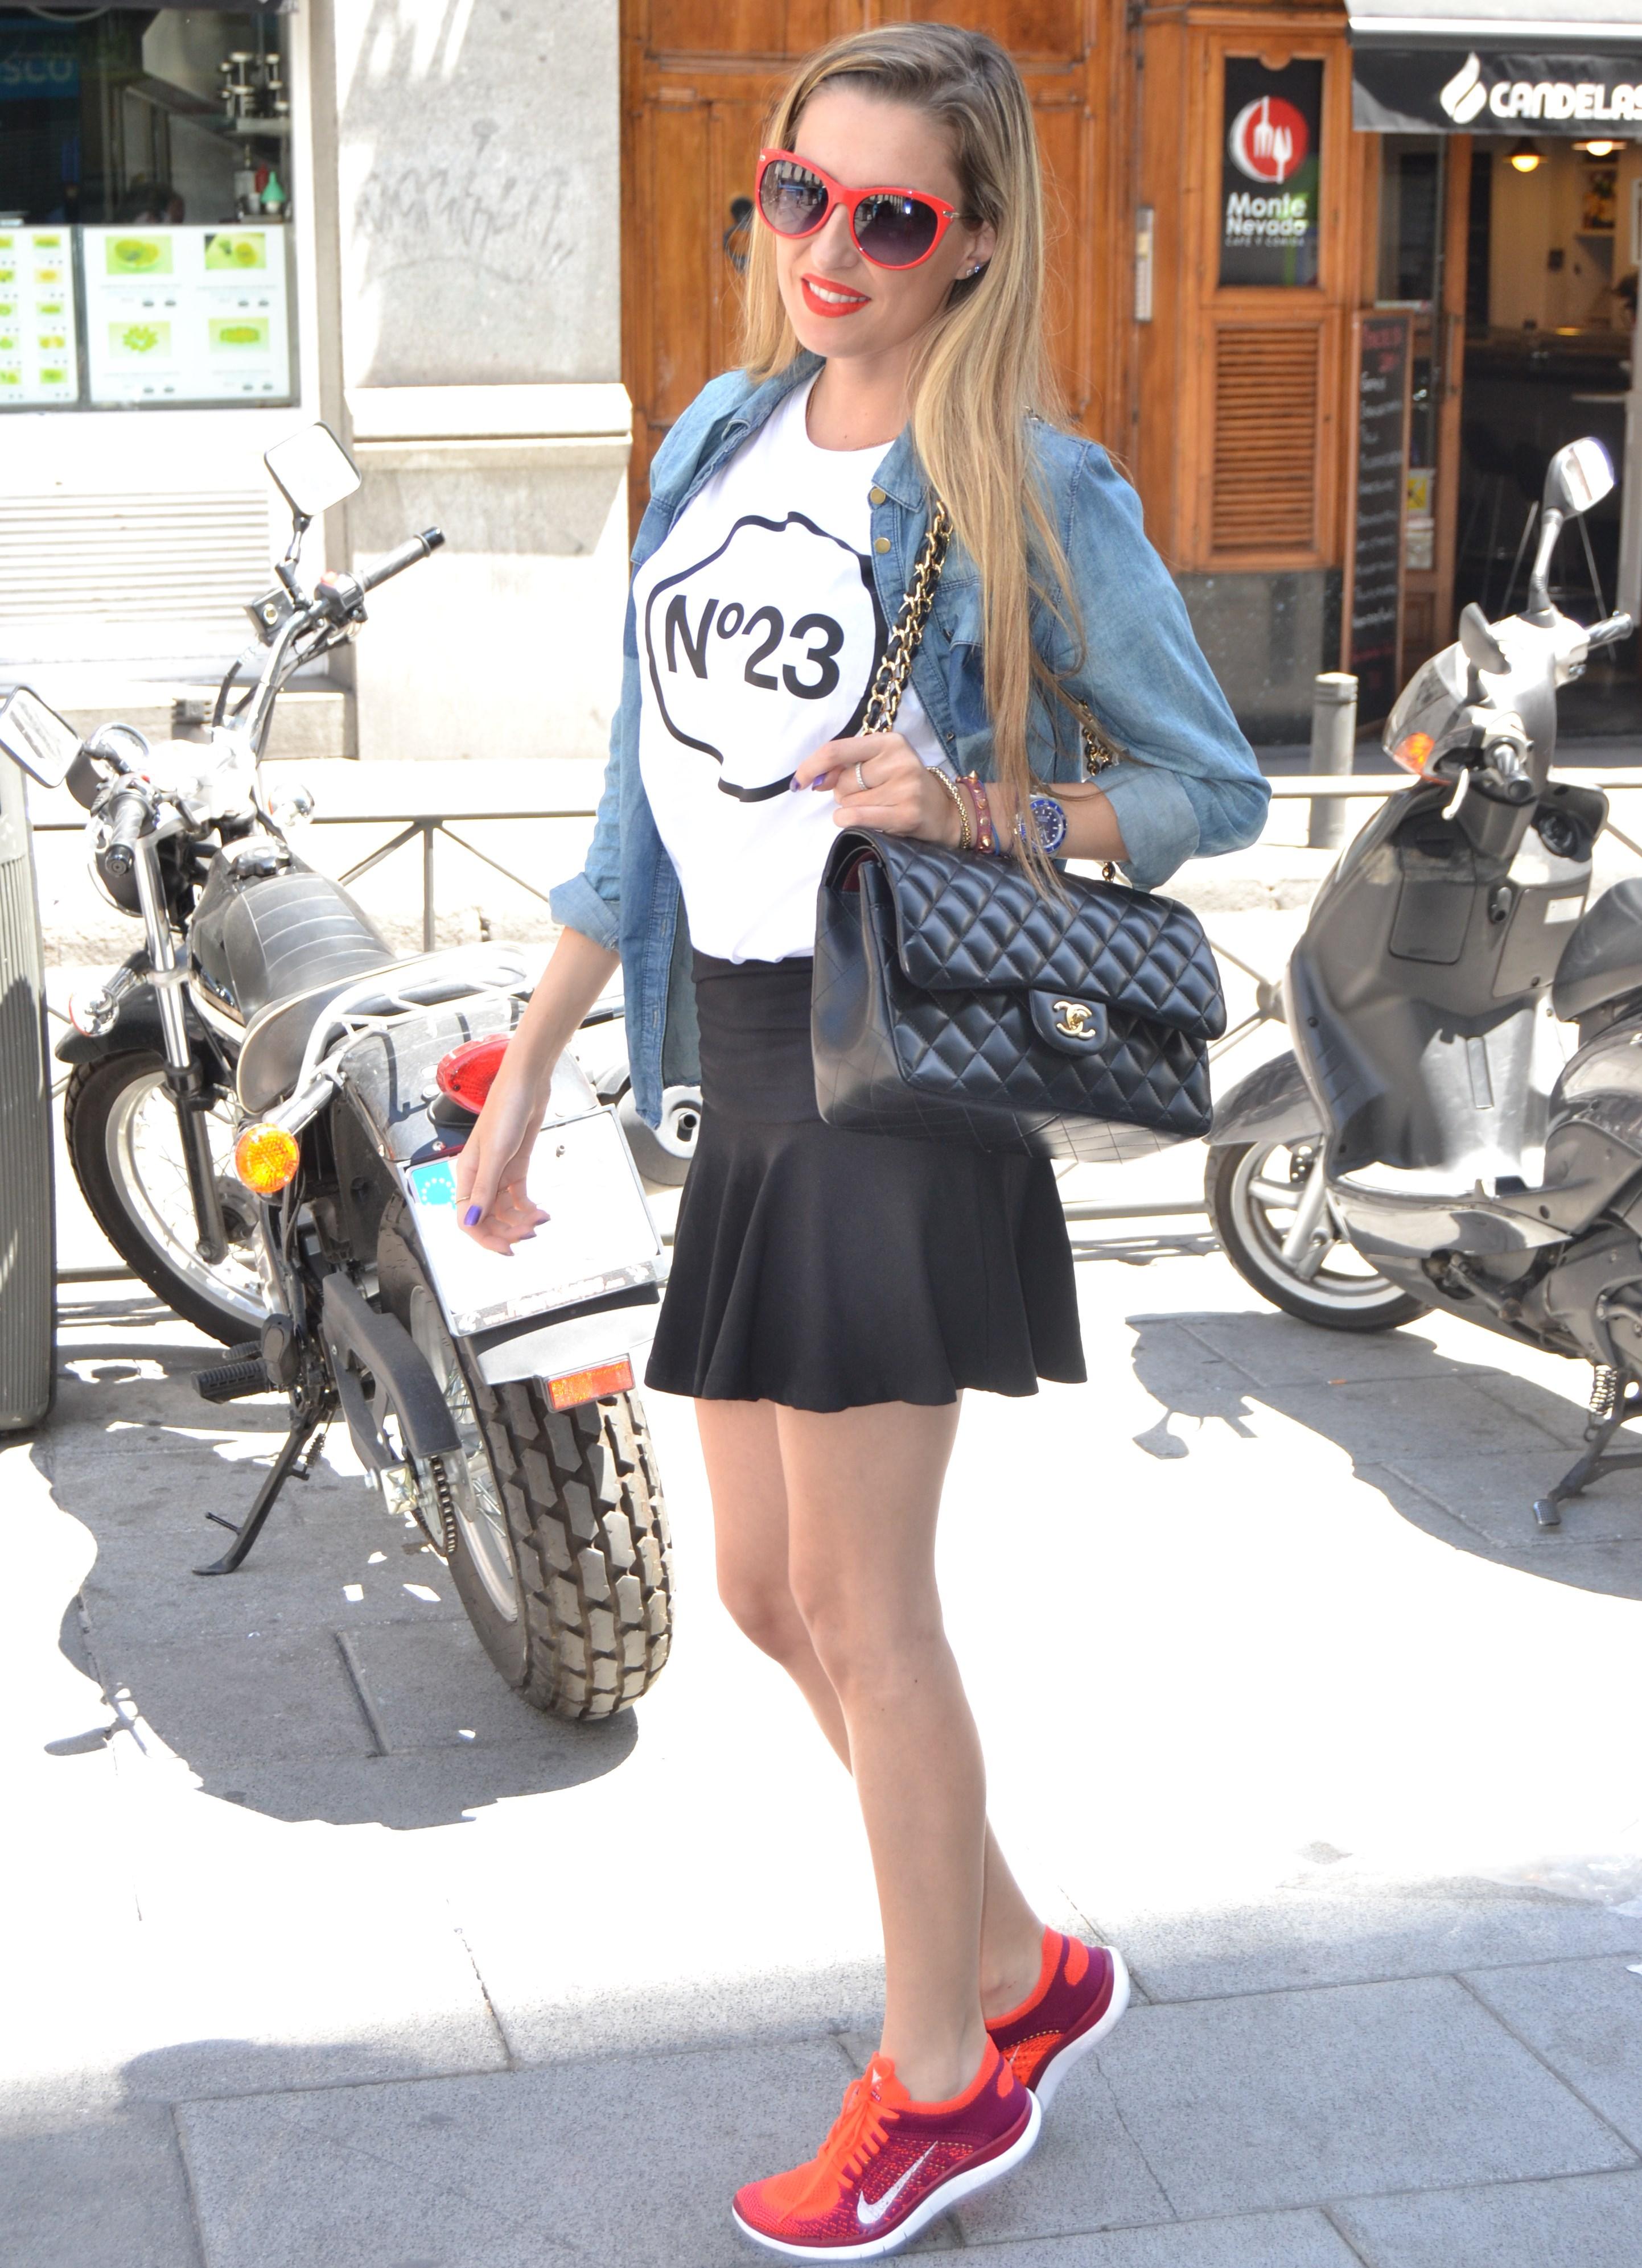 Nike_Free_FlyKnight_Sneakers_Chanel_255_Chanel_Bag_Guess_Sunglasses_Denim_Shirt_Lara_Martin_Gilarranz_Bymyheels (6)